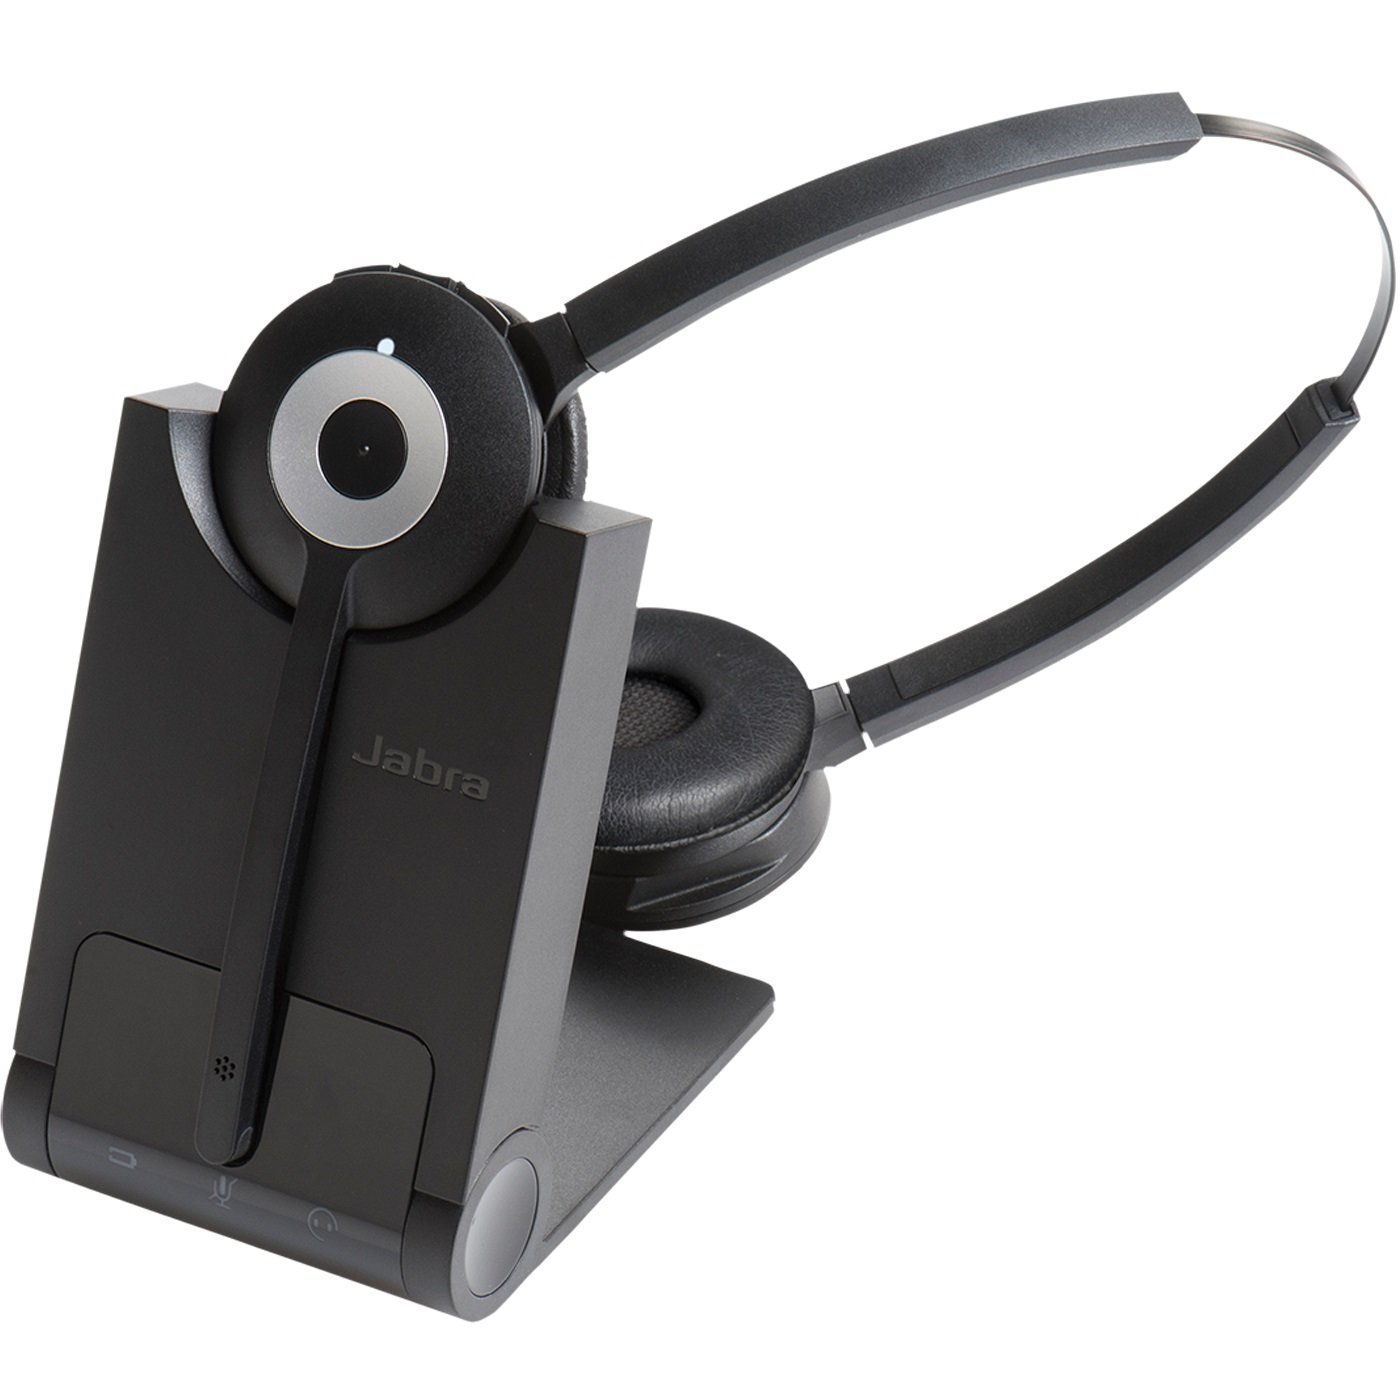 Amazon.com: Jabra Pro 920 Duo - Headset - Black (920-69-508-105): Computers  & Accessories